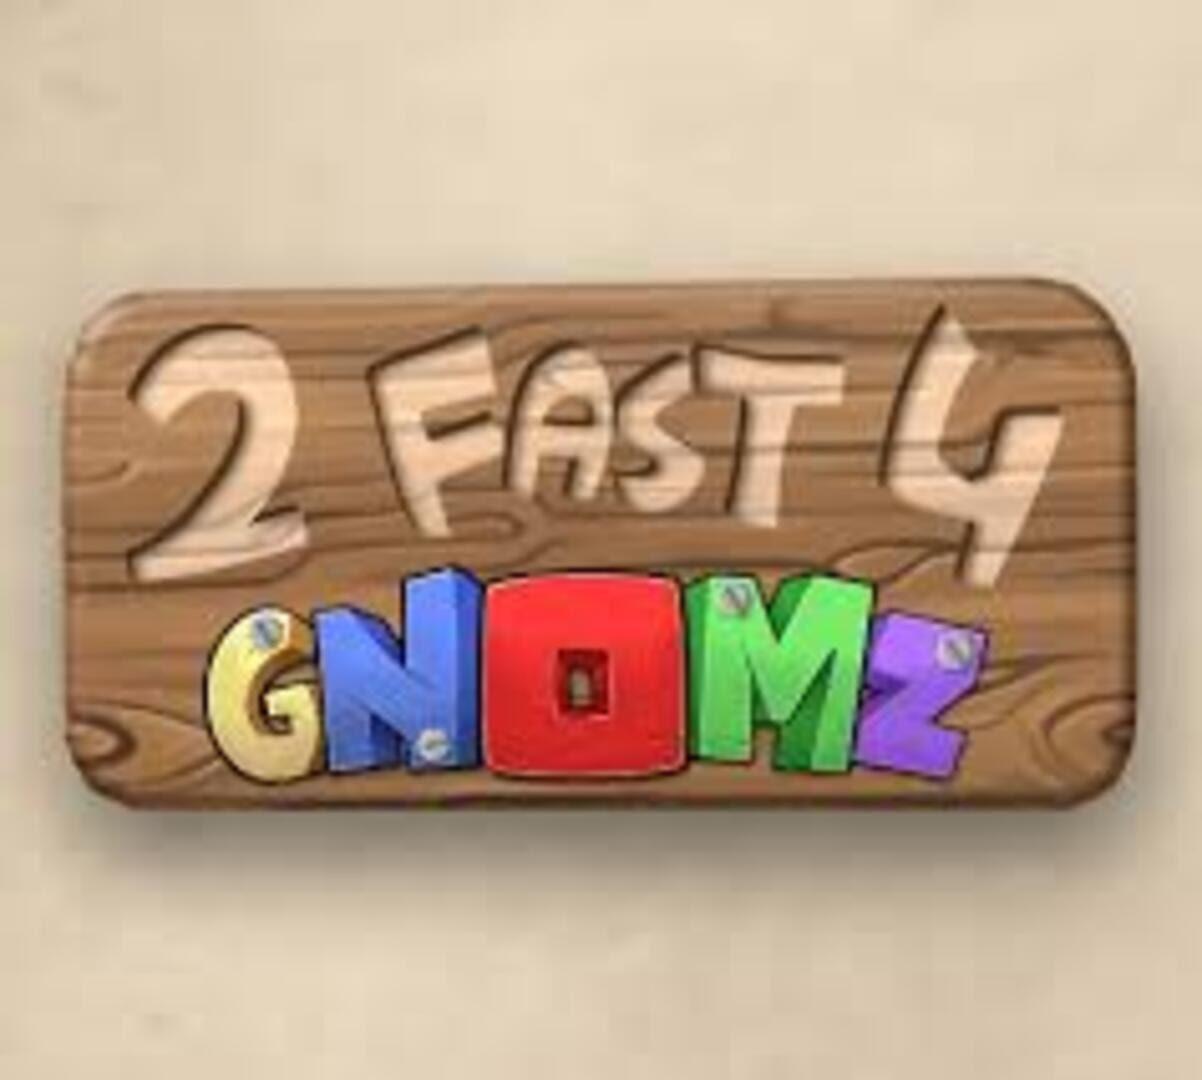 buy 2 Fast 4 Gnomz cd key for all platform